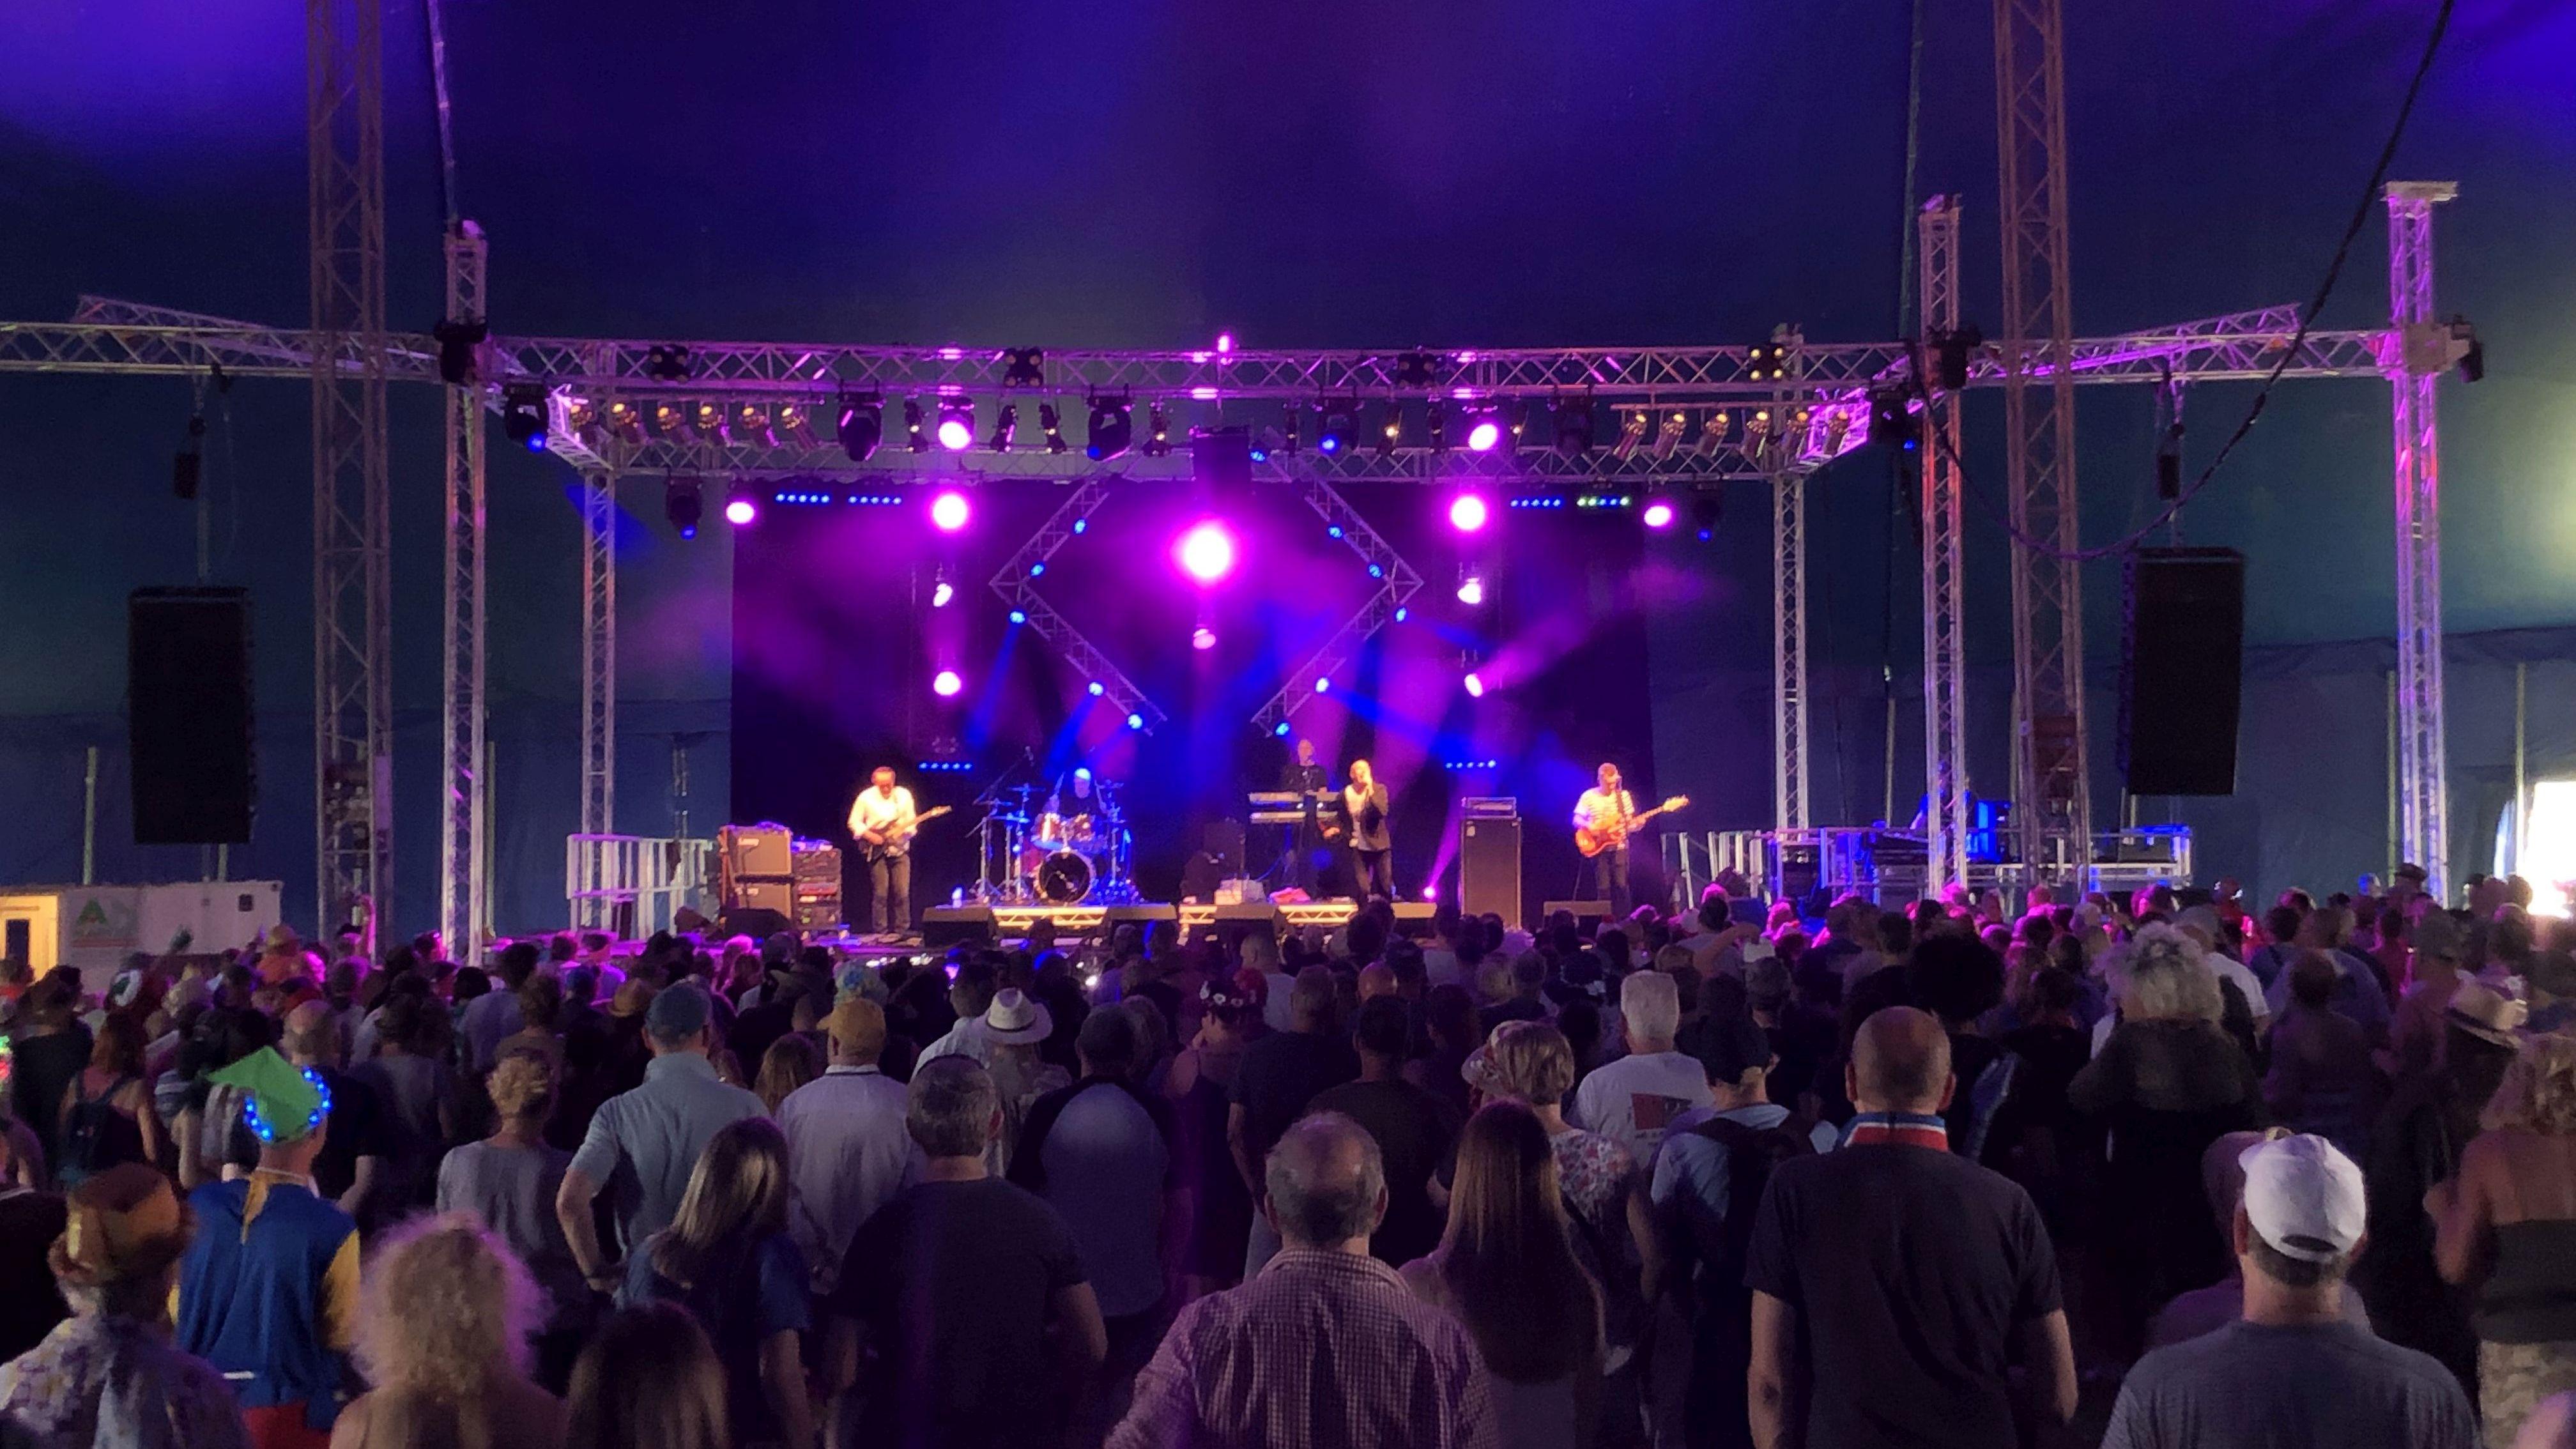 OneBigStar Glastonbudget Festival 2019 Technical Production